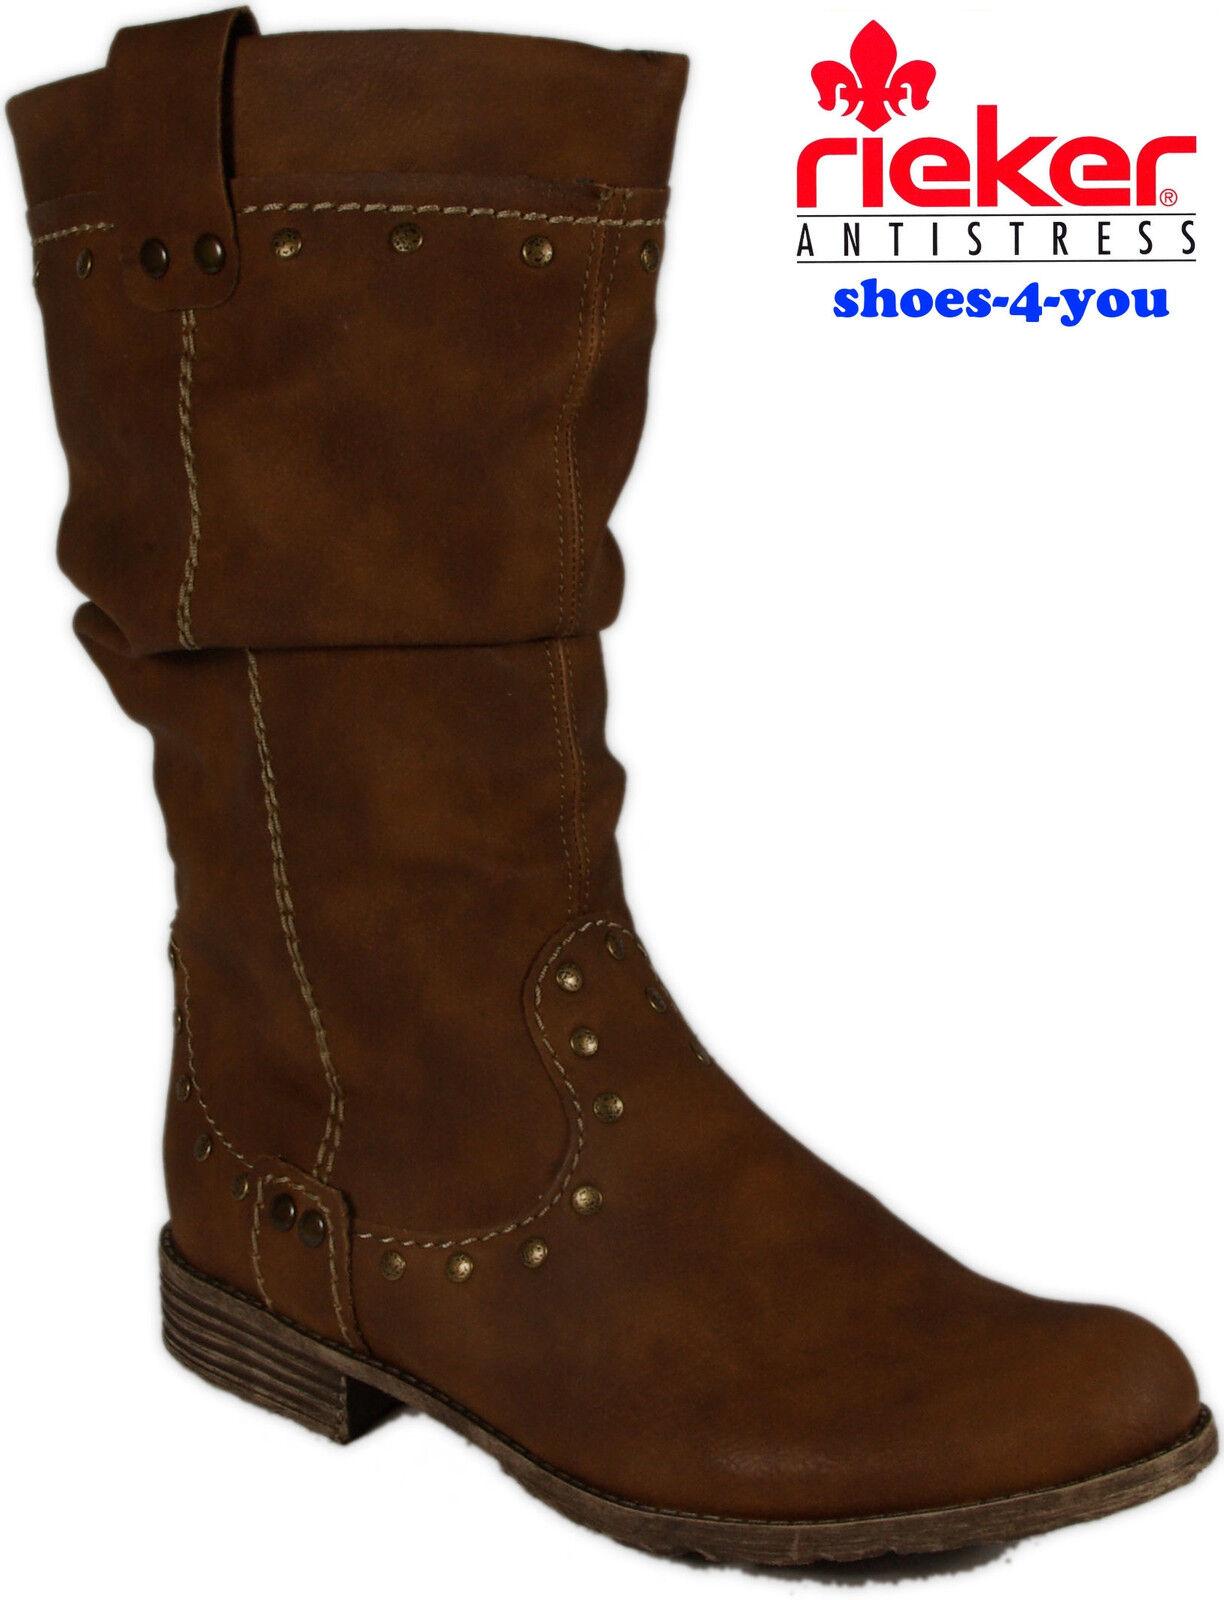 Rieker zapatos botas Lang caña marrón cremallera alimento caliente nuevo de cordero